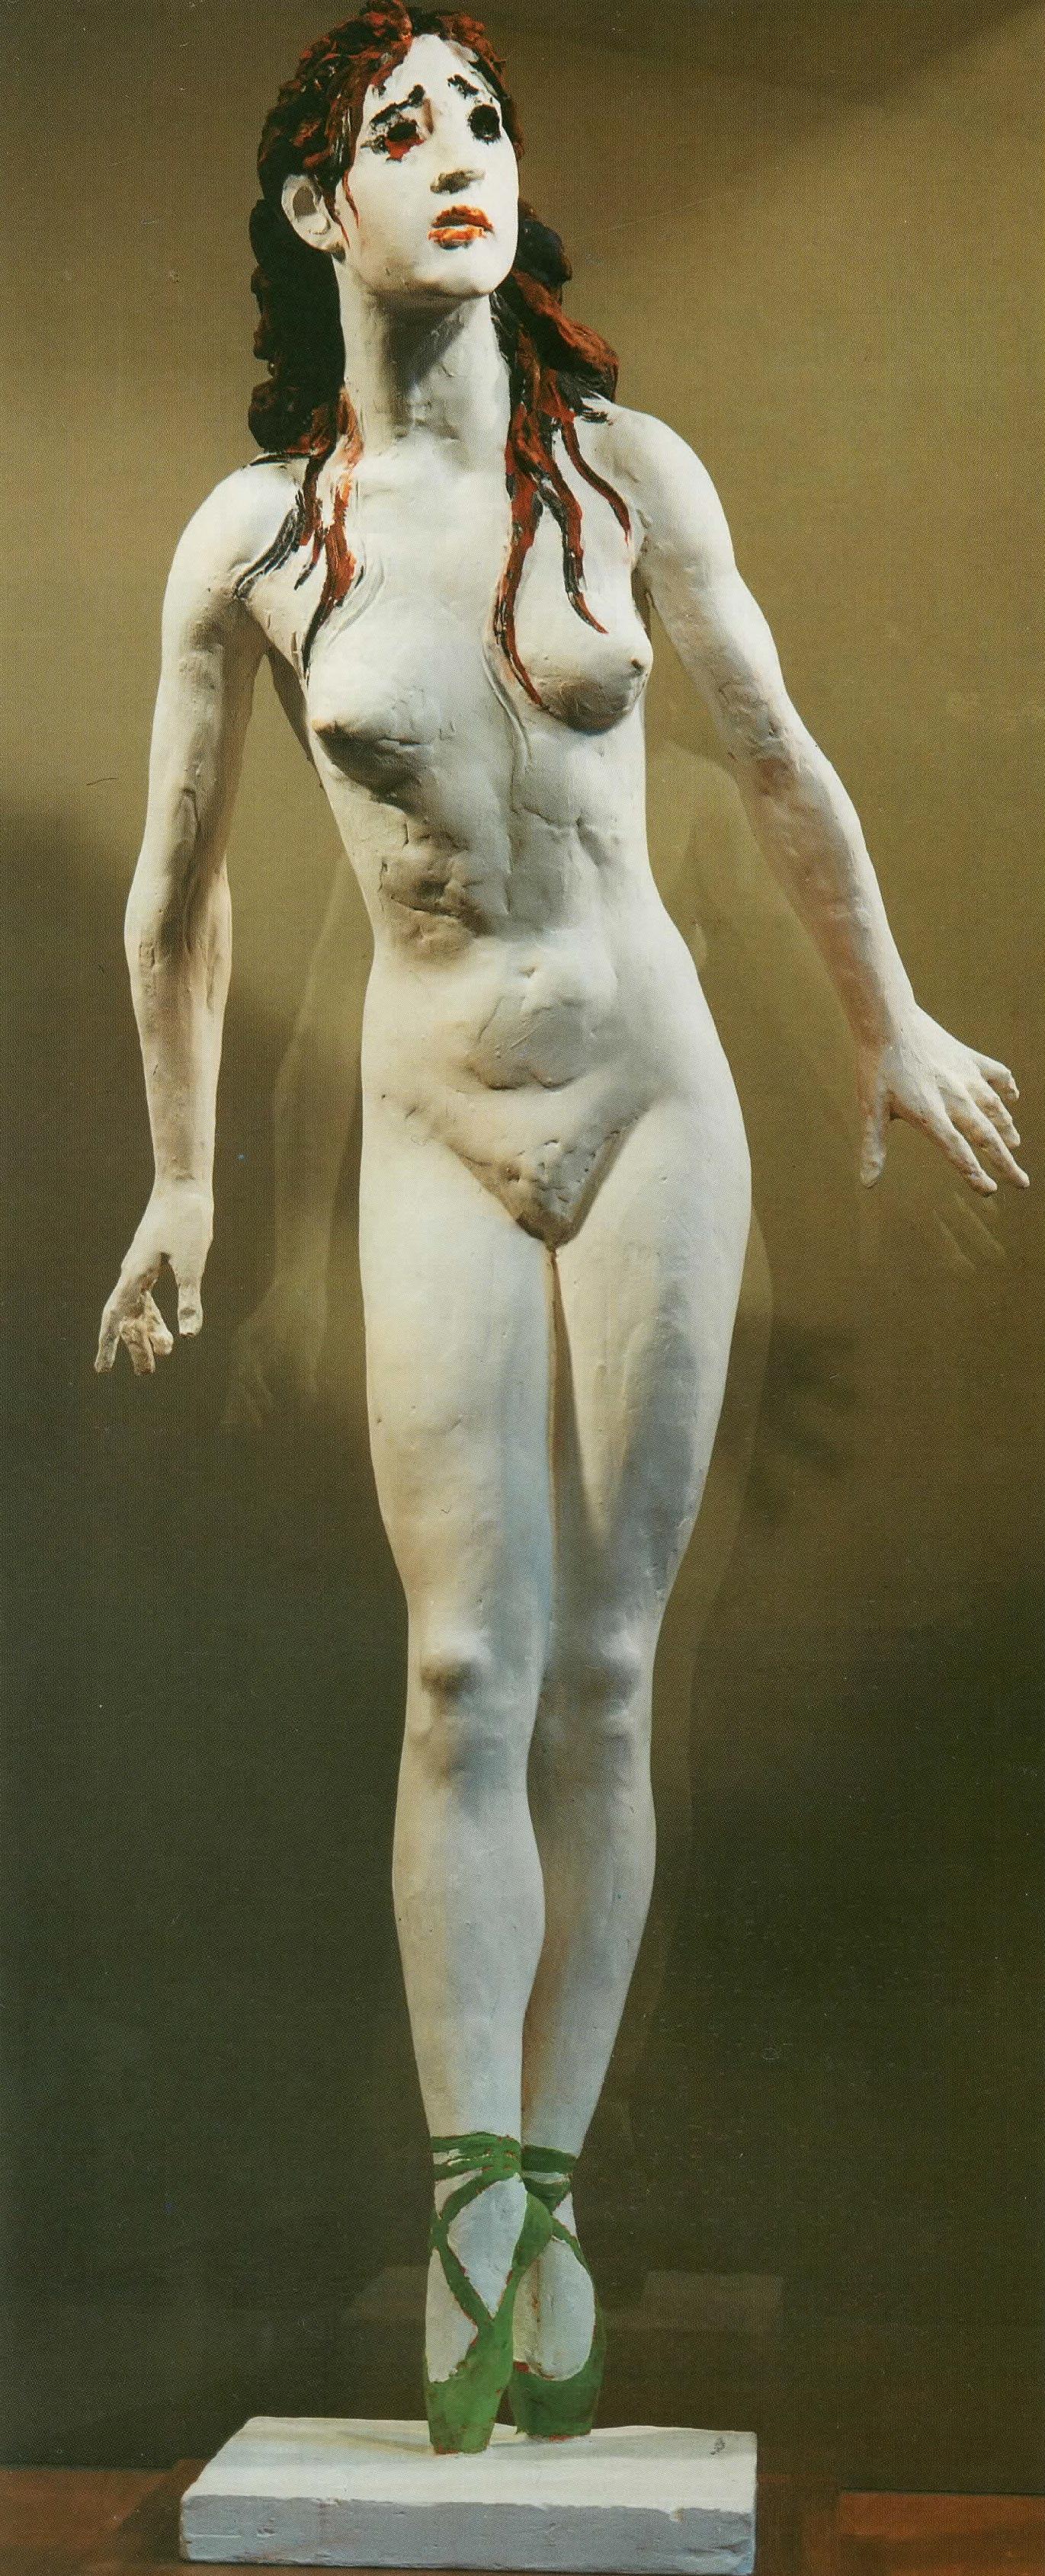 Francesco Messina - Royal ballet